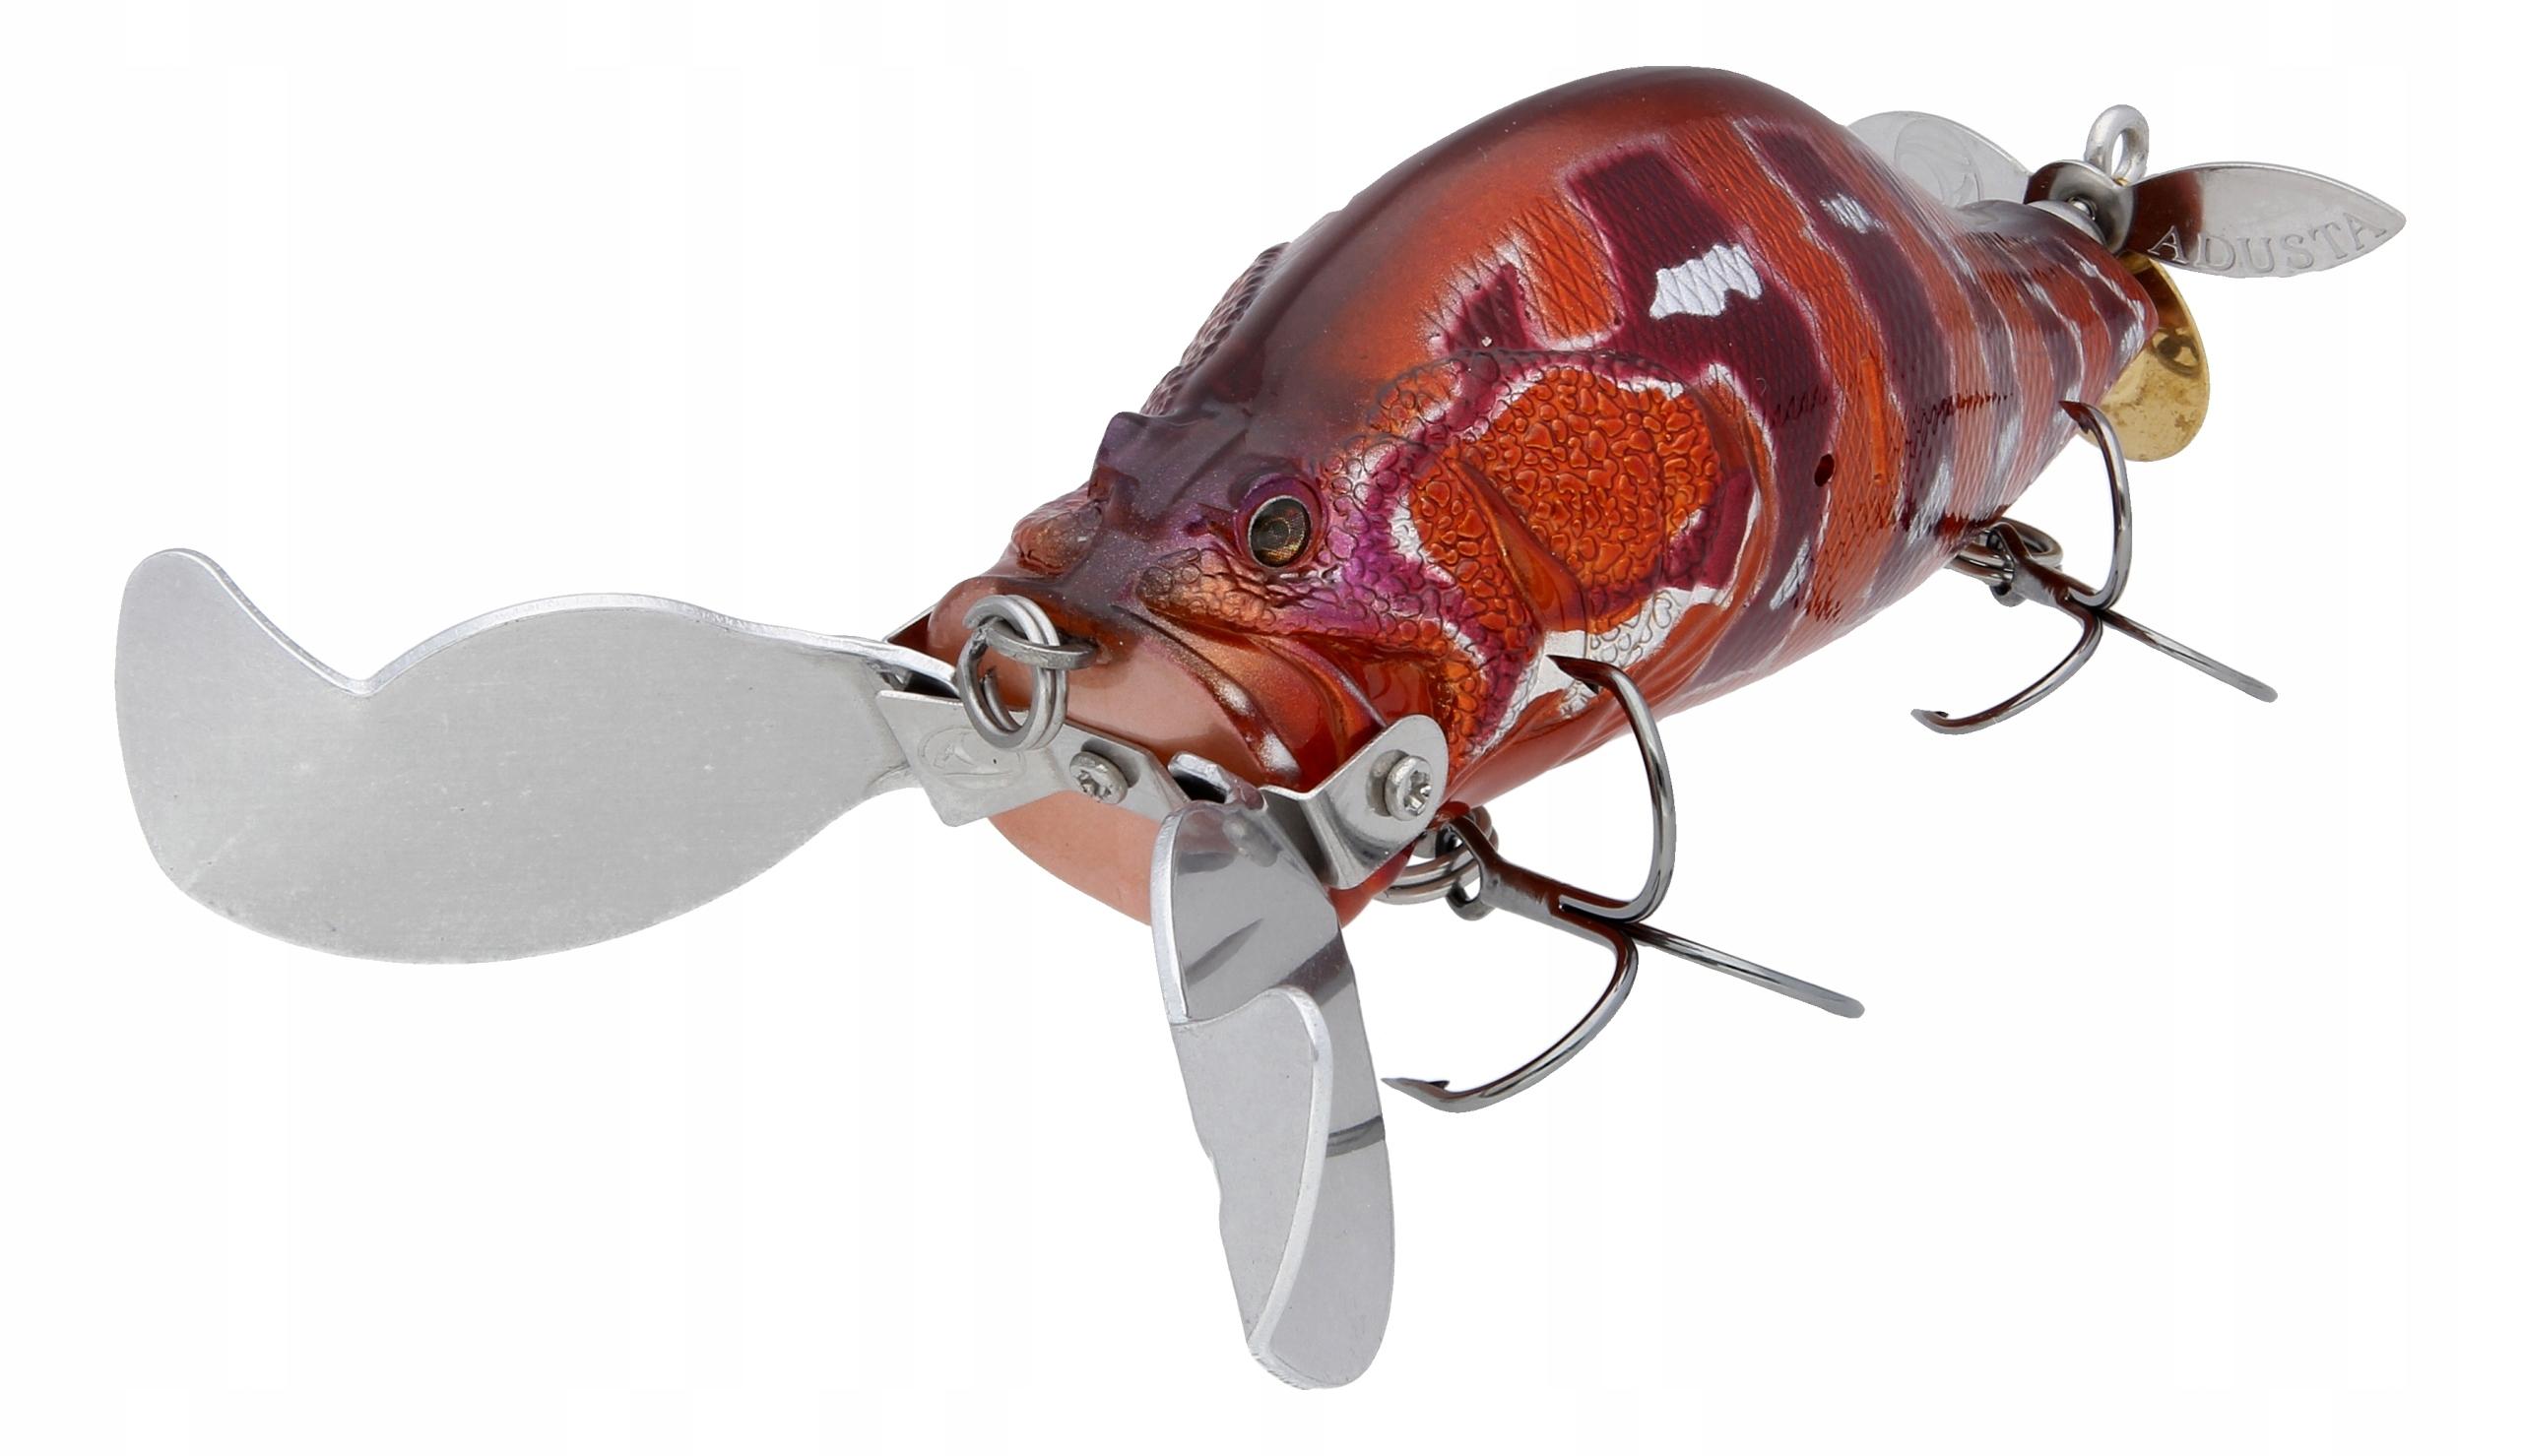 Adusta zacrawl heart бластер 9cm 33g 015 akahata